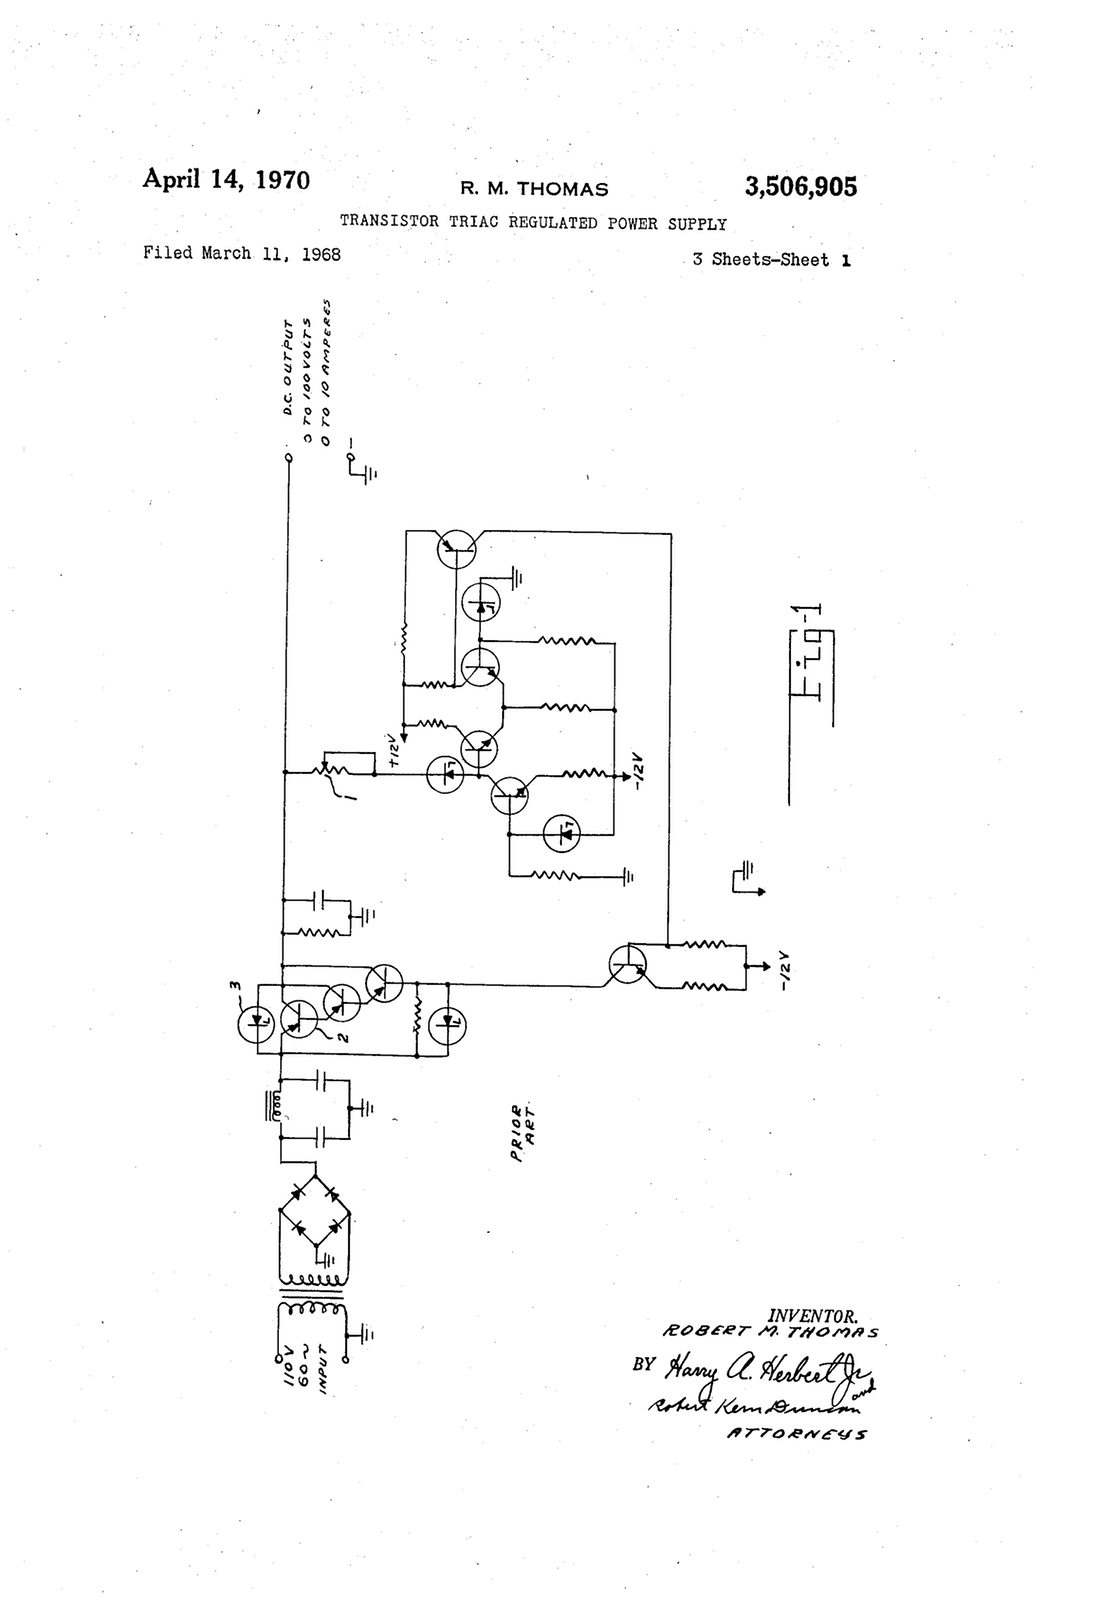 1100x1616 patent us3506905 transistor triac regulated power supply drawing